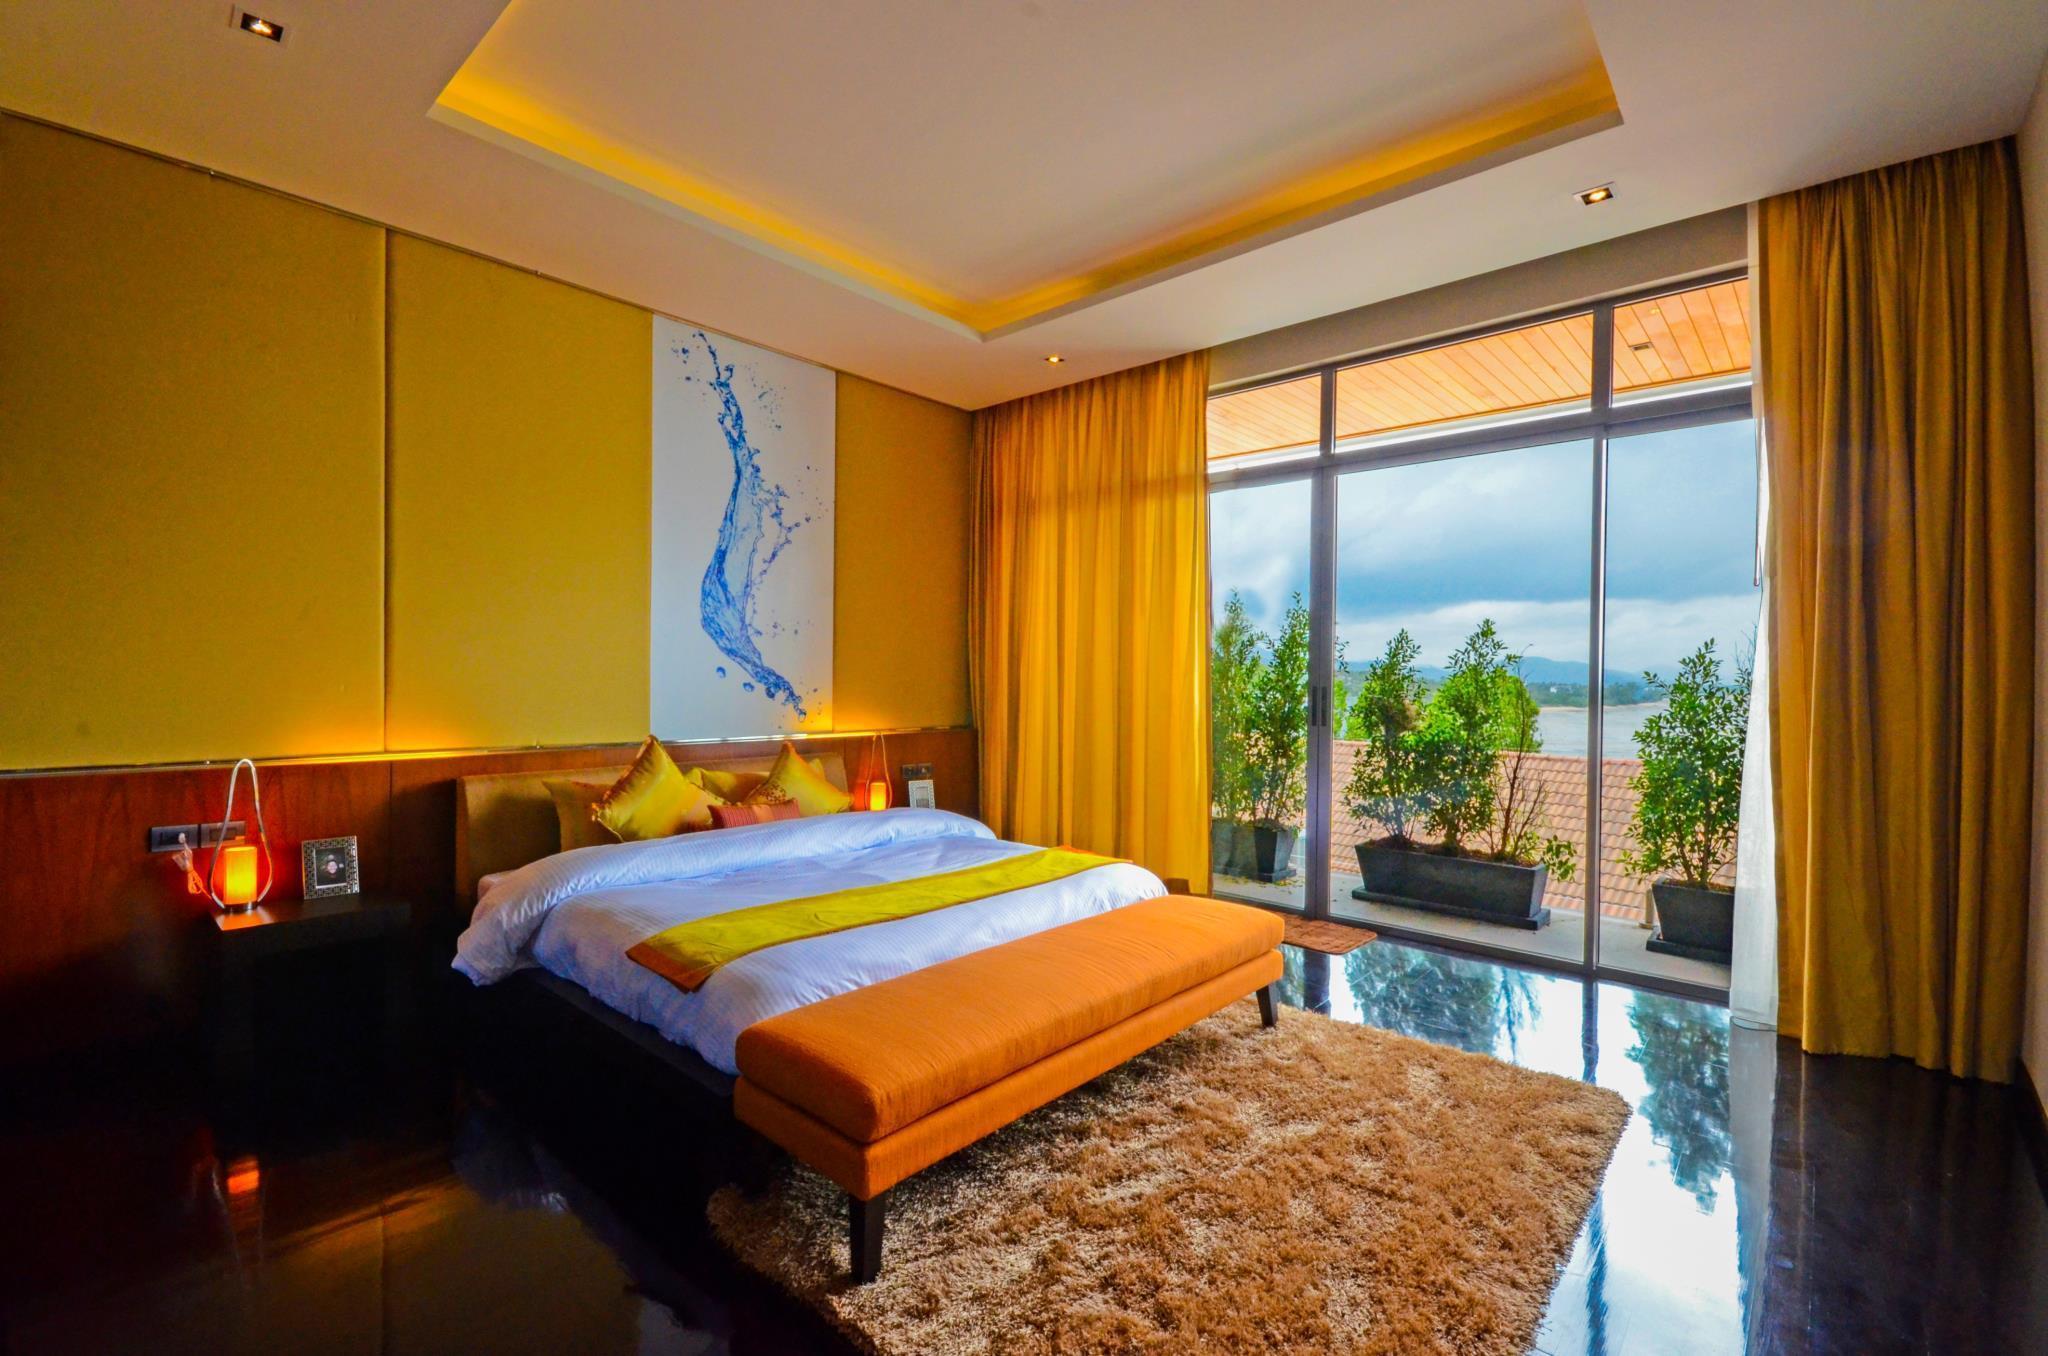 Aqua Sea View Villas Rawai อควา ซี วิว วิลลาส์ ราไวย์